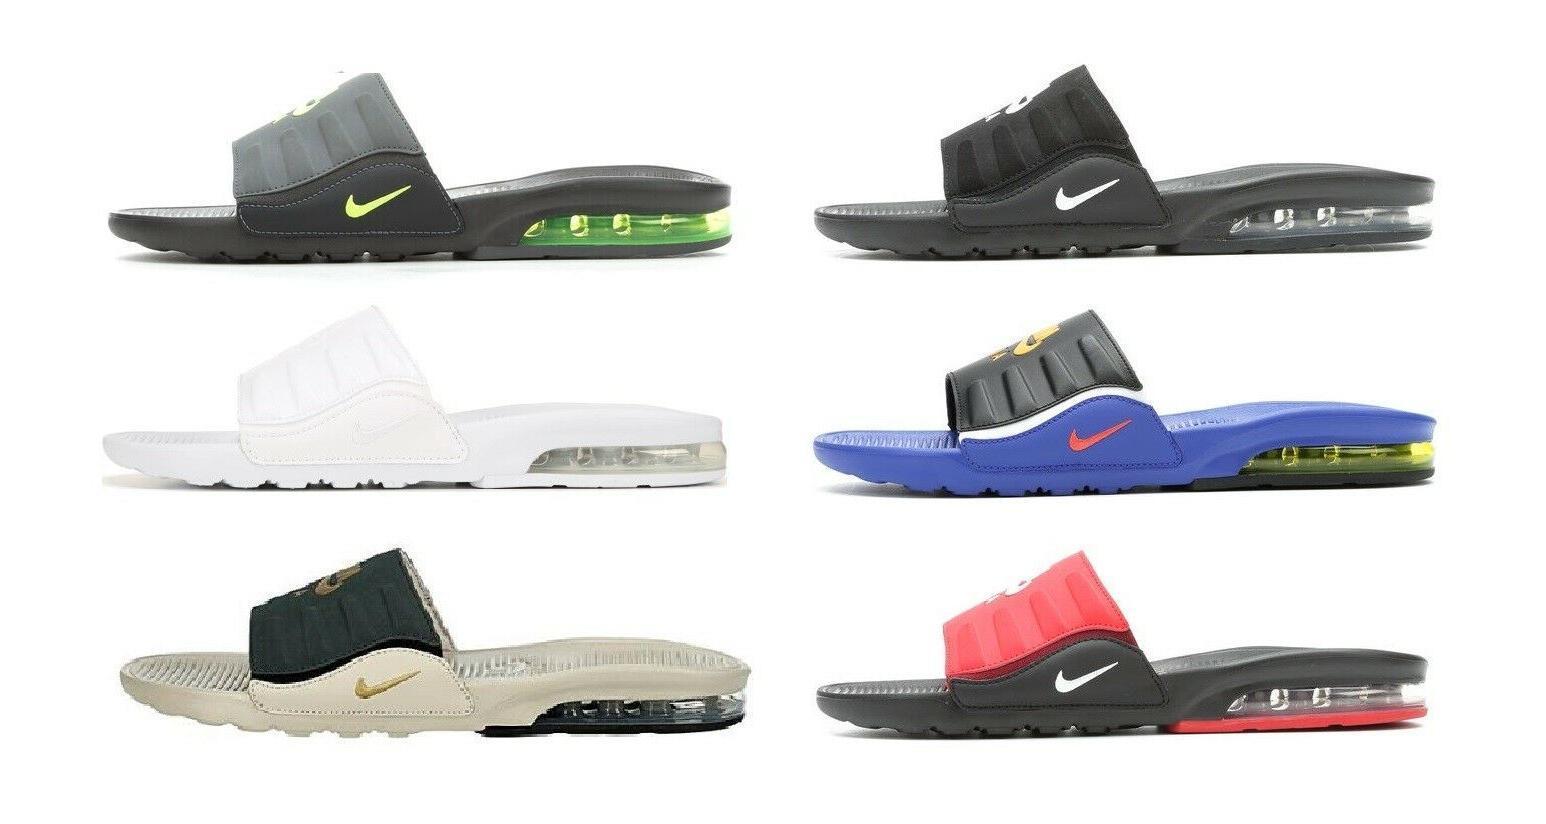 Nike Air Max Men's Slides Slip On Sandals Shoes Slippers